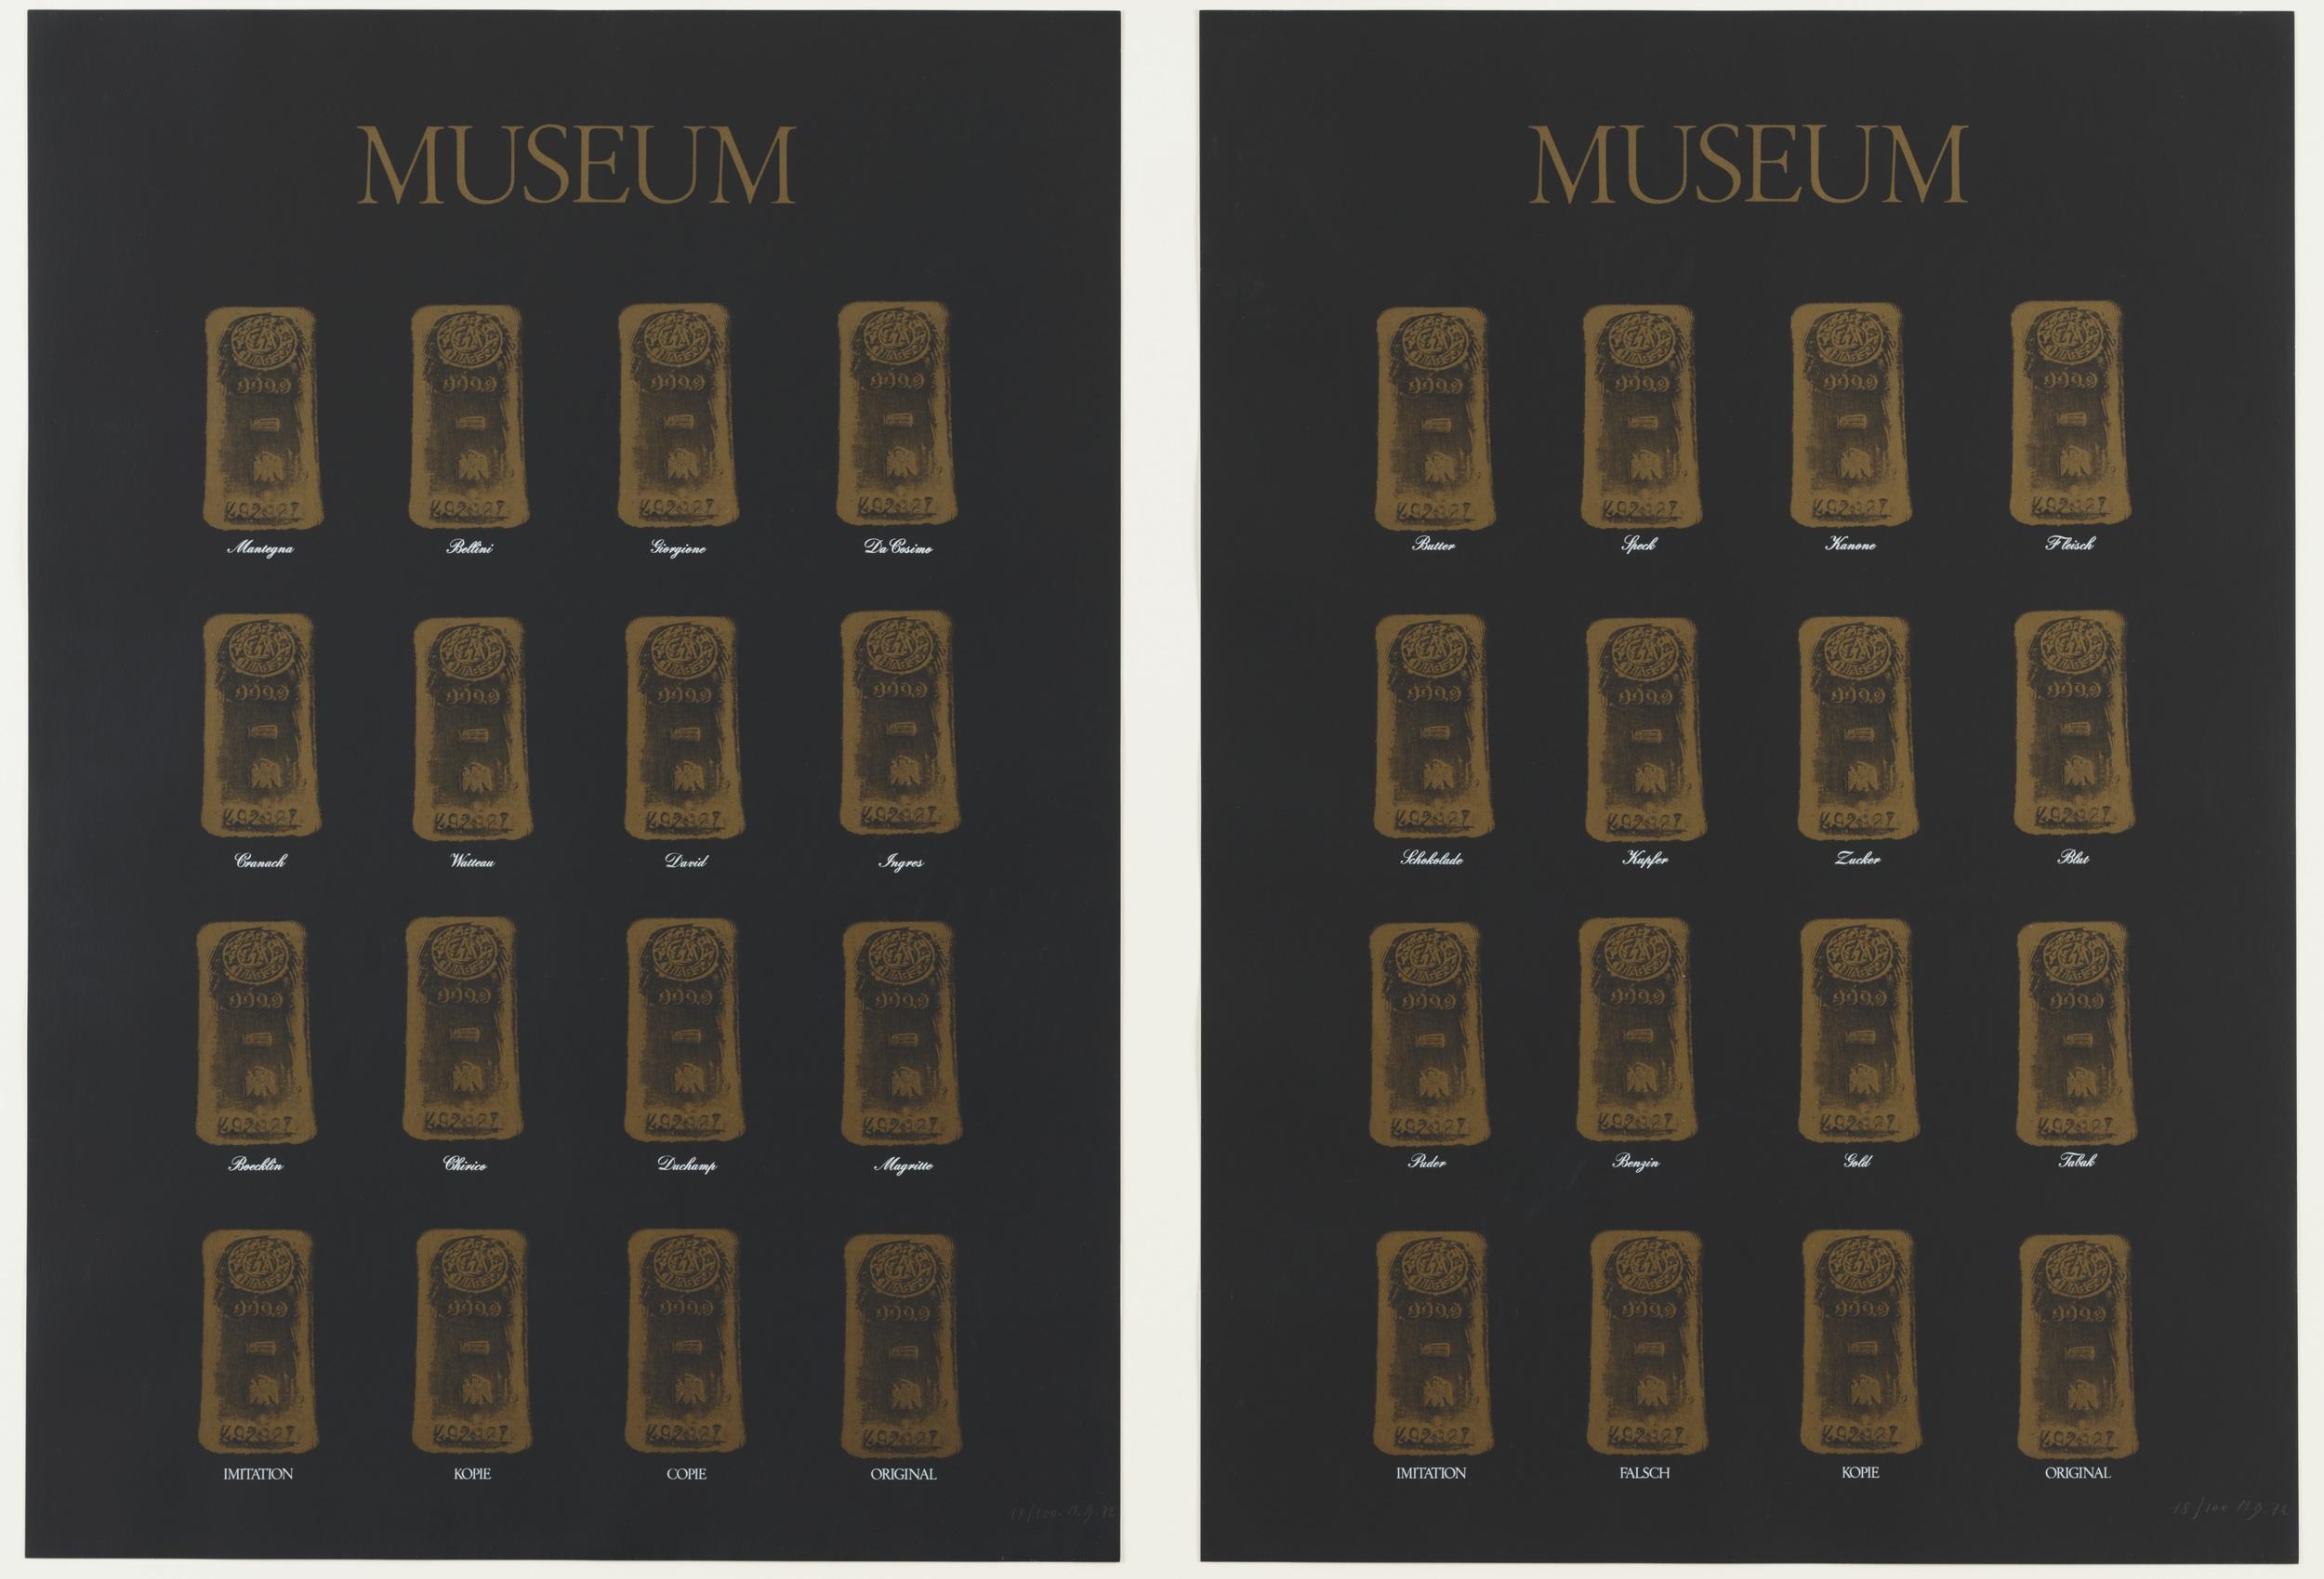 Marcel Broodthaers (Belgian, 1924–1976). Museum-Museum. 1972. Two screenprints, each print: 33 x 23 1/4 in. (83 x 59.1 cm). Publisher: Edition Staeck, Heidelberg, Germany. Printer: Gerhard Steidl, Göttingen, Germany. Edition: 100. The Museum of Modern Art, New York. The Associates Fund, 1991. © 2016 Estate of Marcel Broodthaers / Artists Rights Society (ARS), New York / SABAM, Brussels